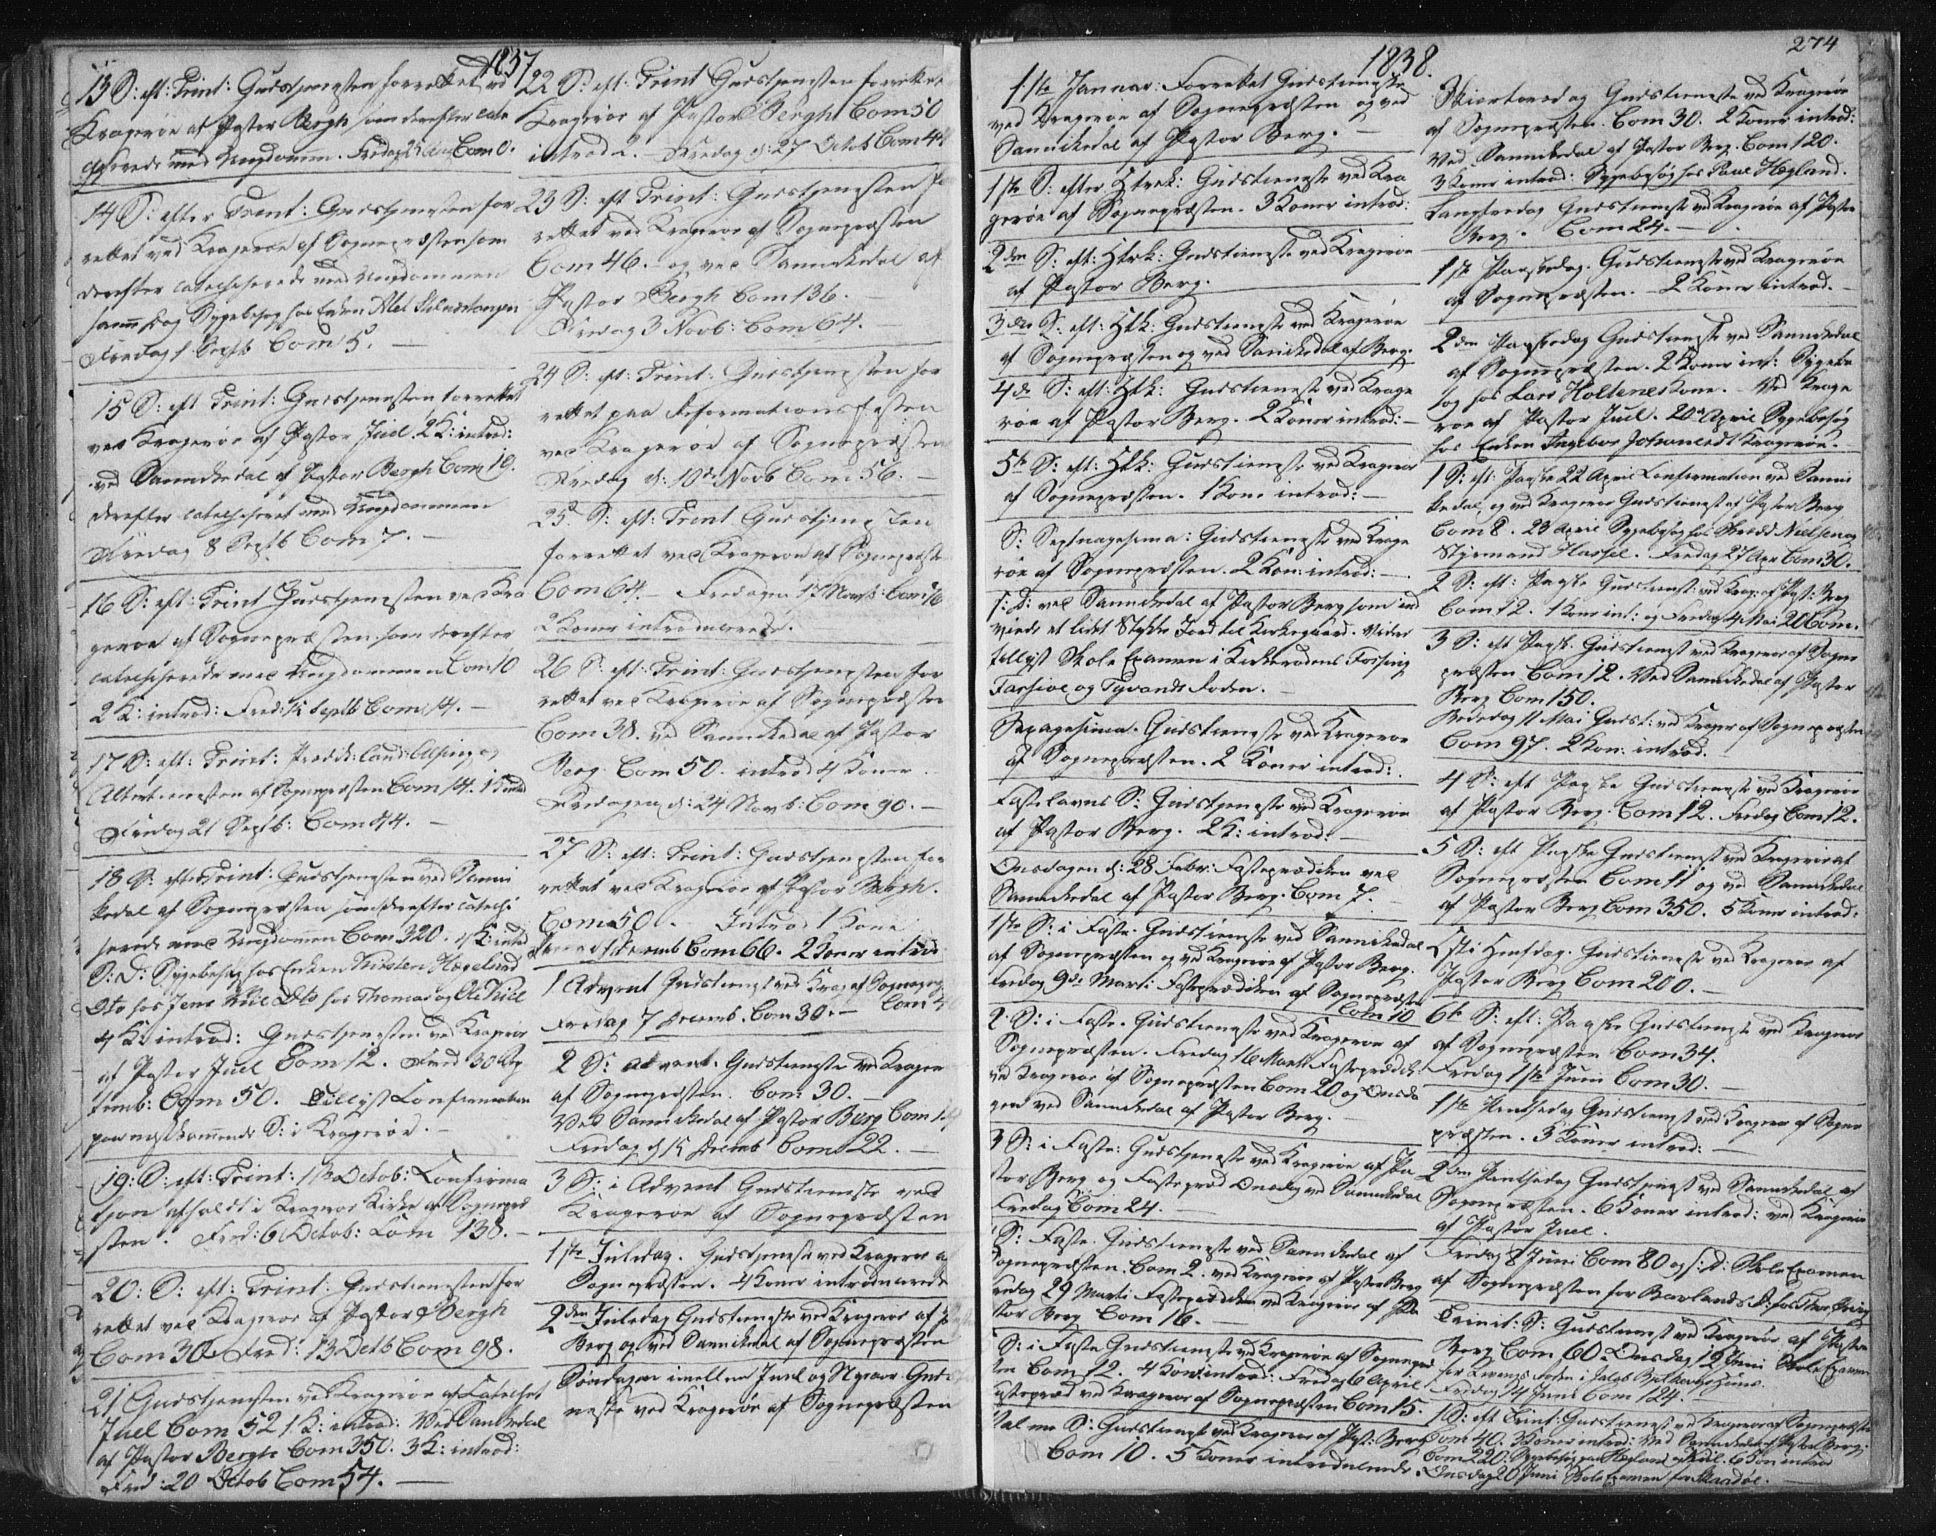 SAKO, Kragerø kirkebøker, F/Fa/L0005: Ministerialbok nr. 5, 1832-1847, s. 274